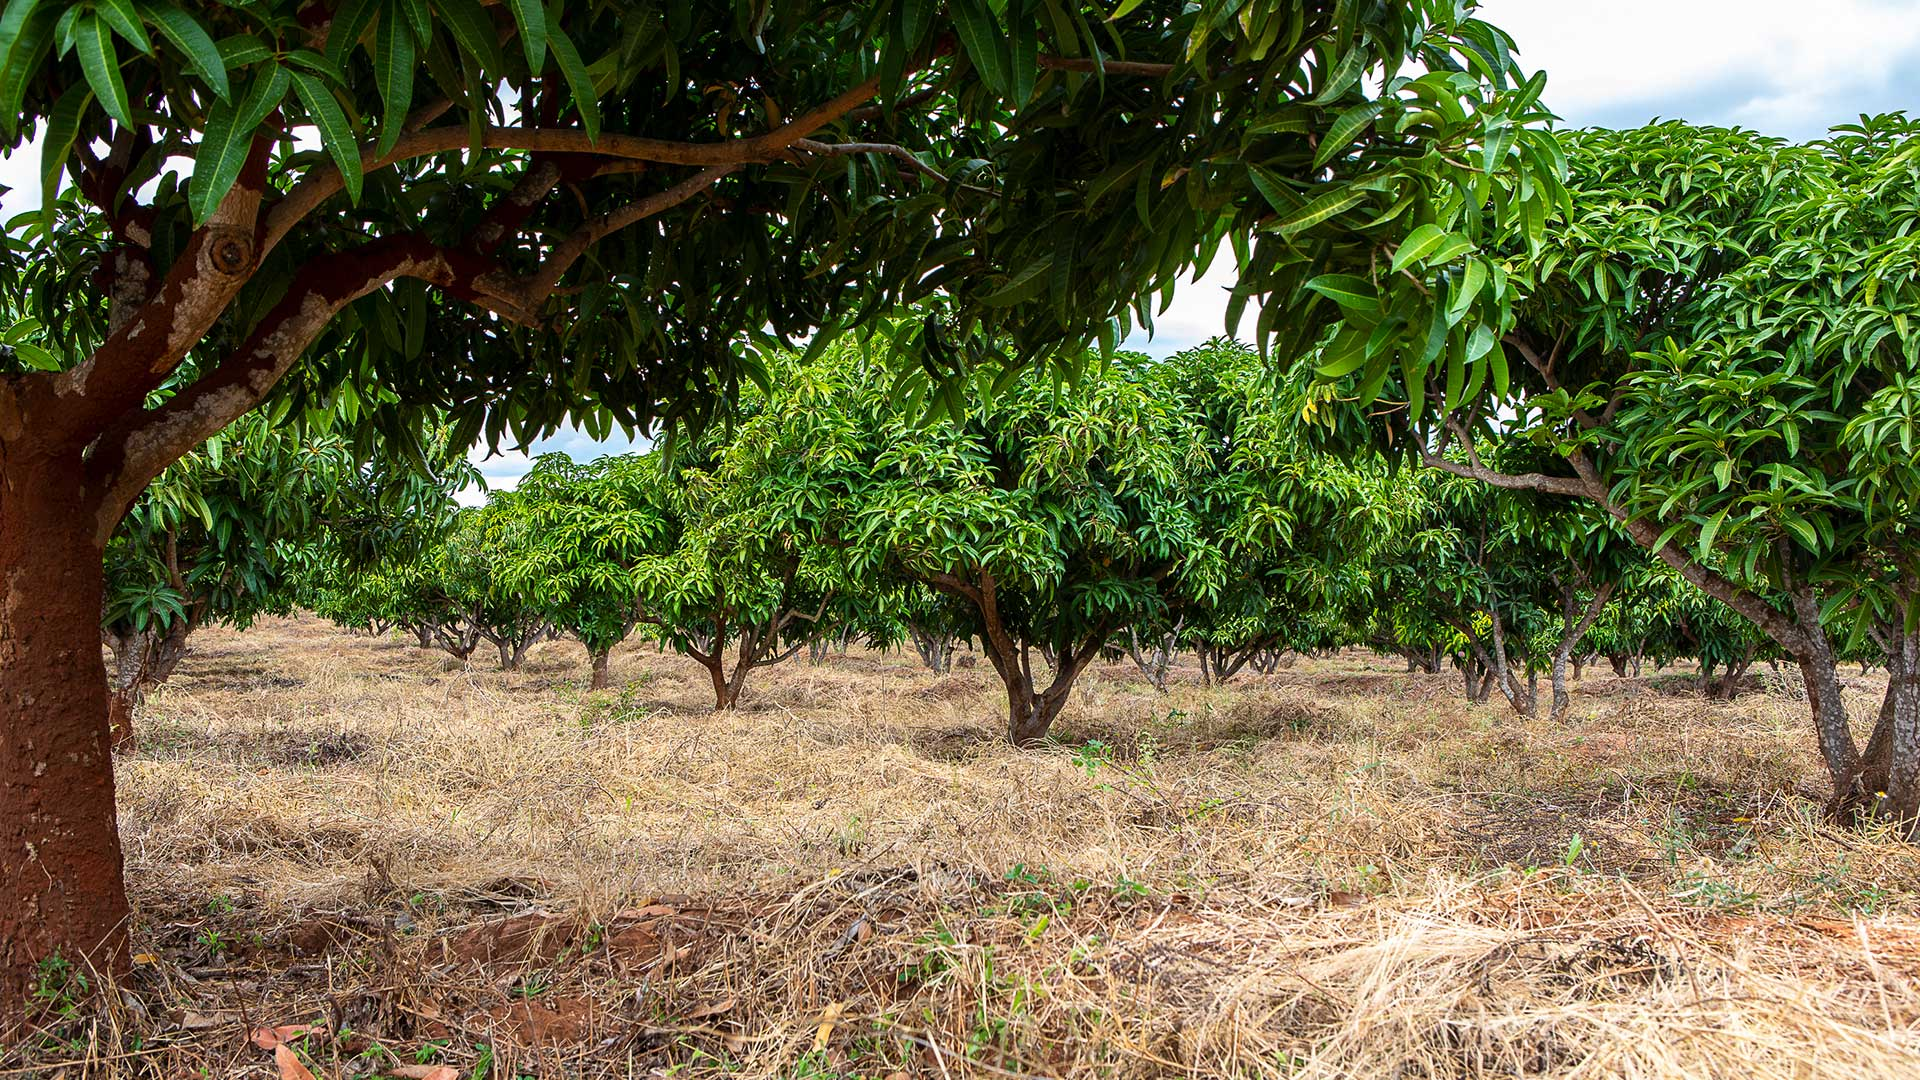 A close-up of the mango trees in Kibwezi